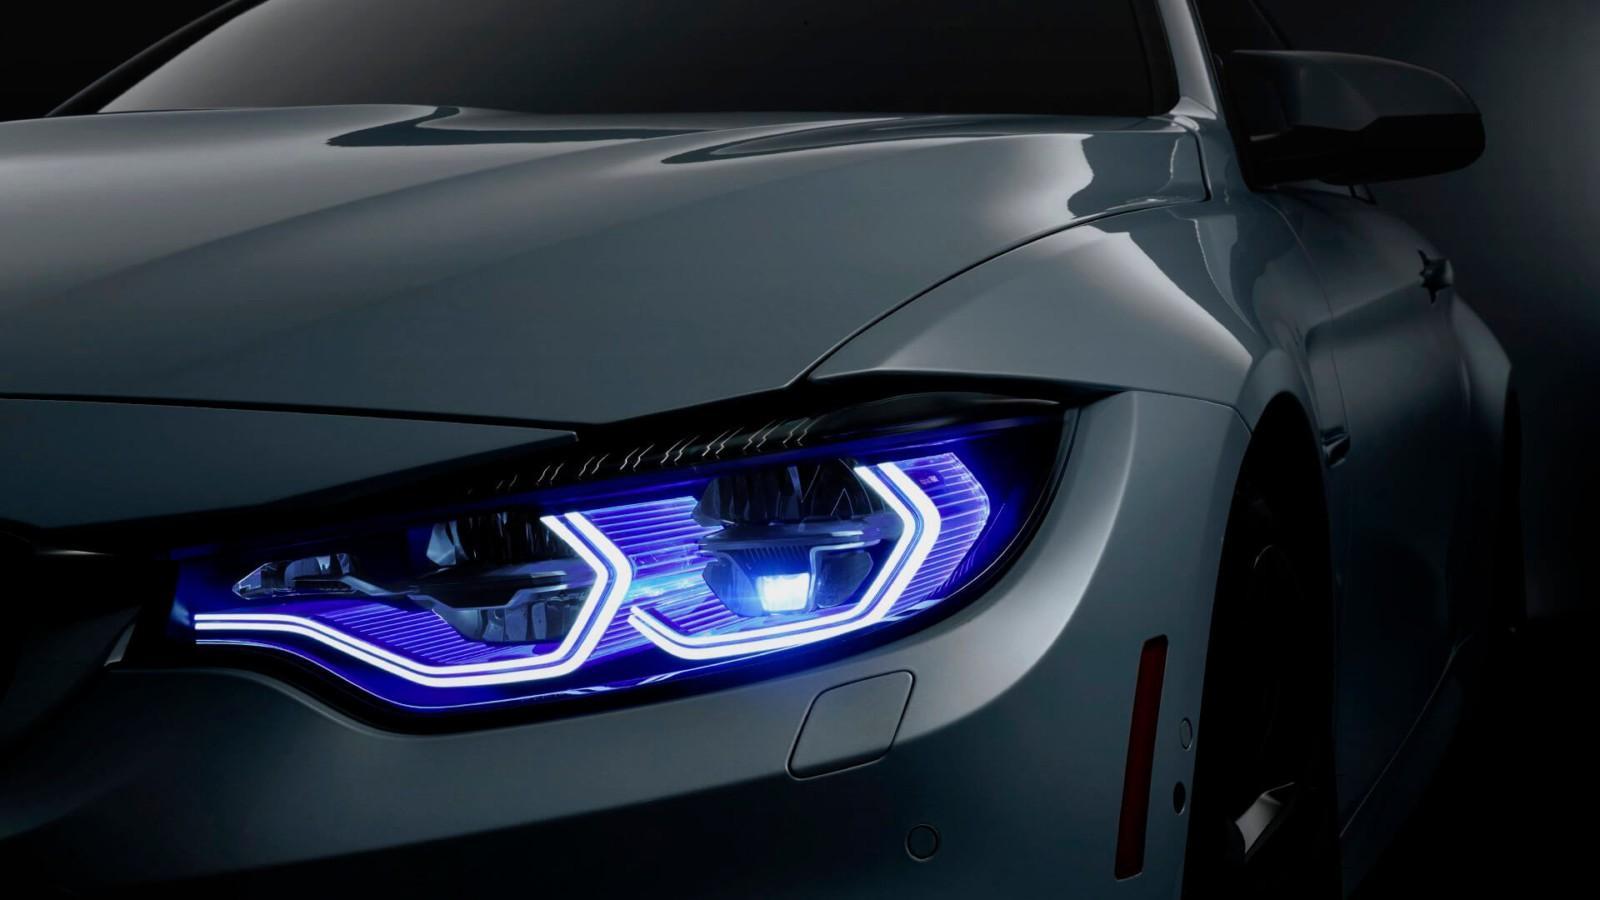 car headlight protection